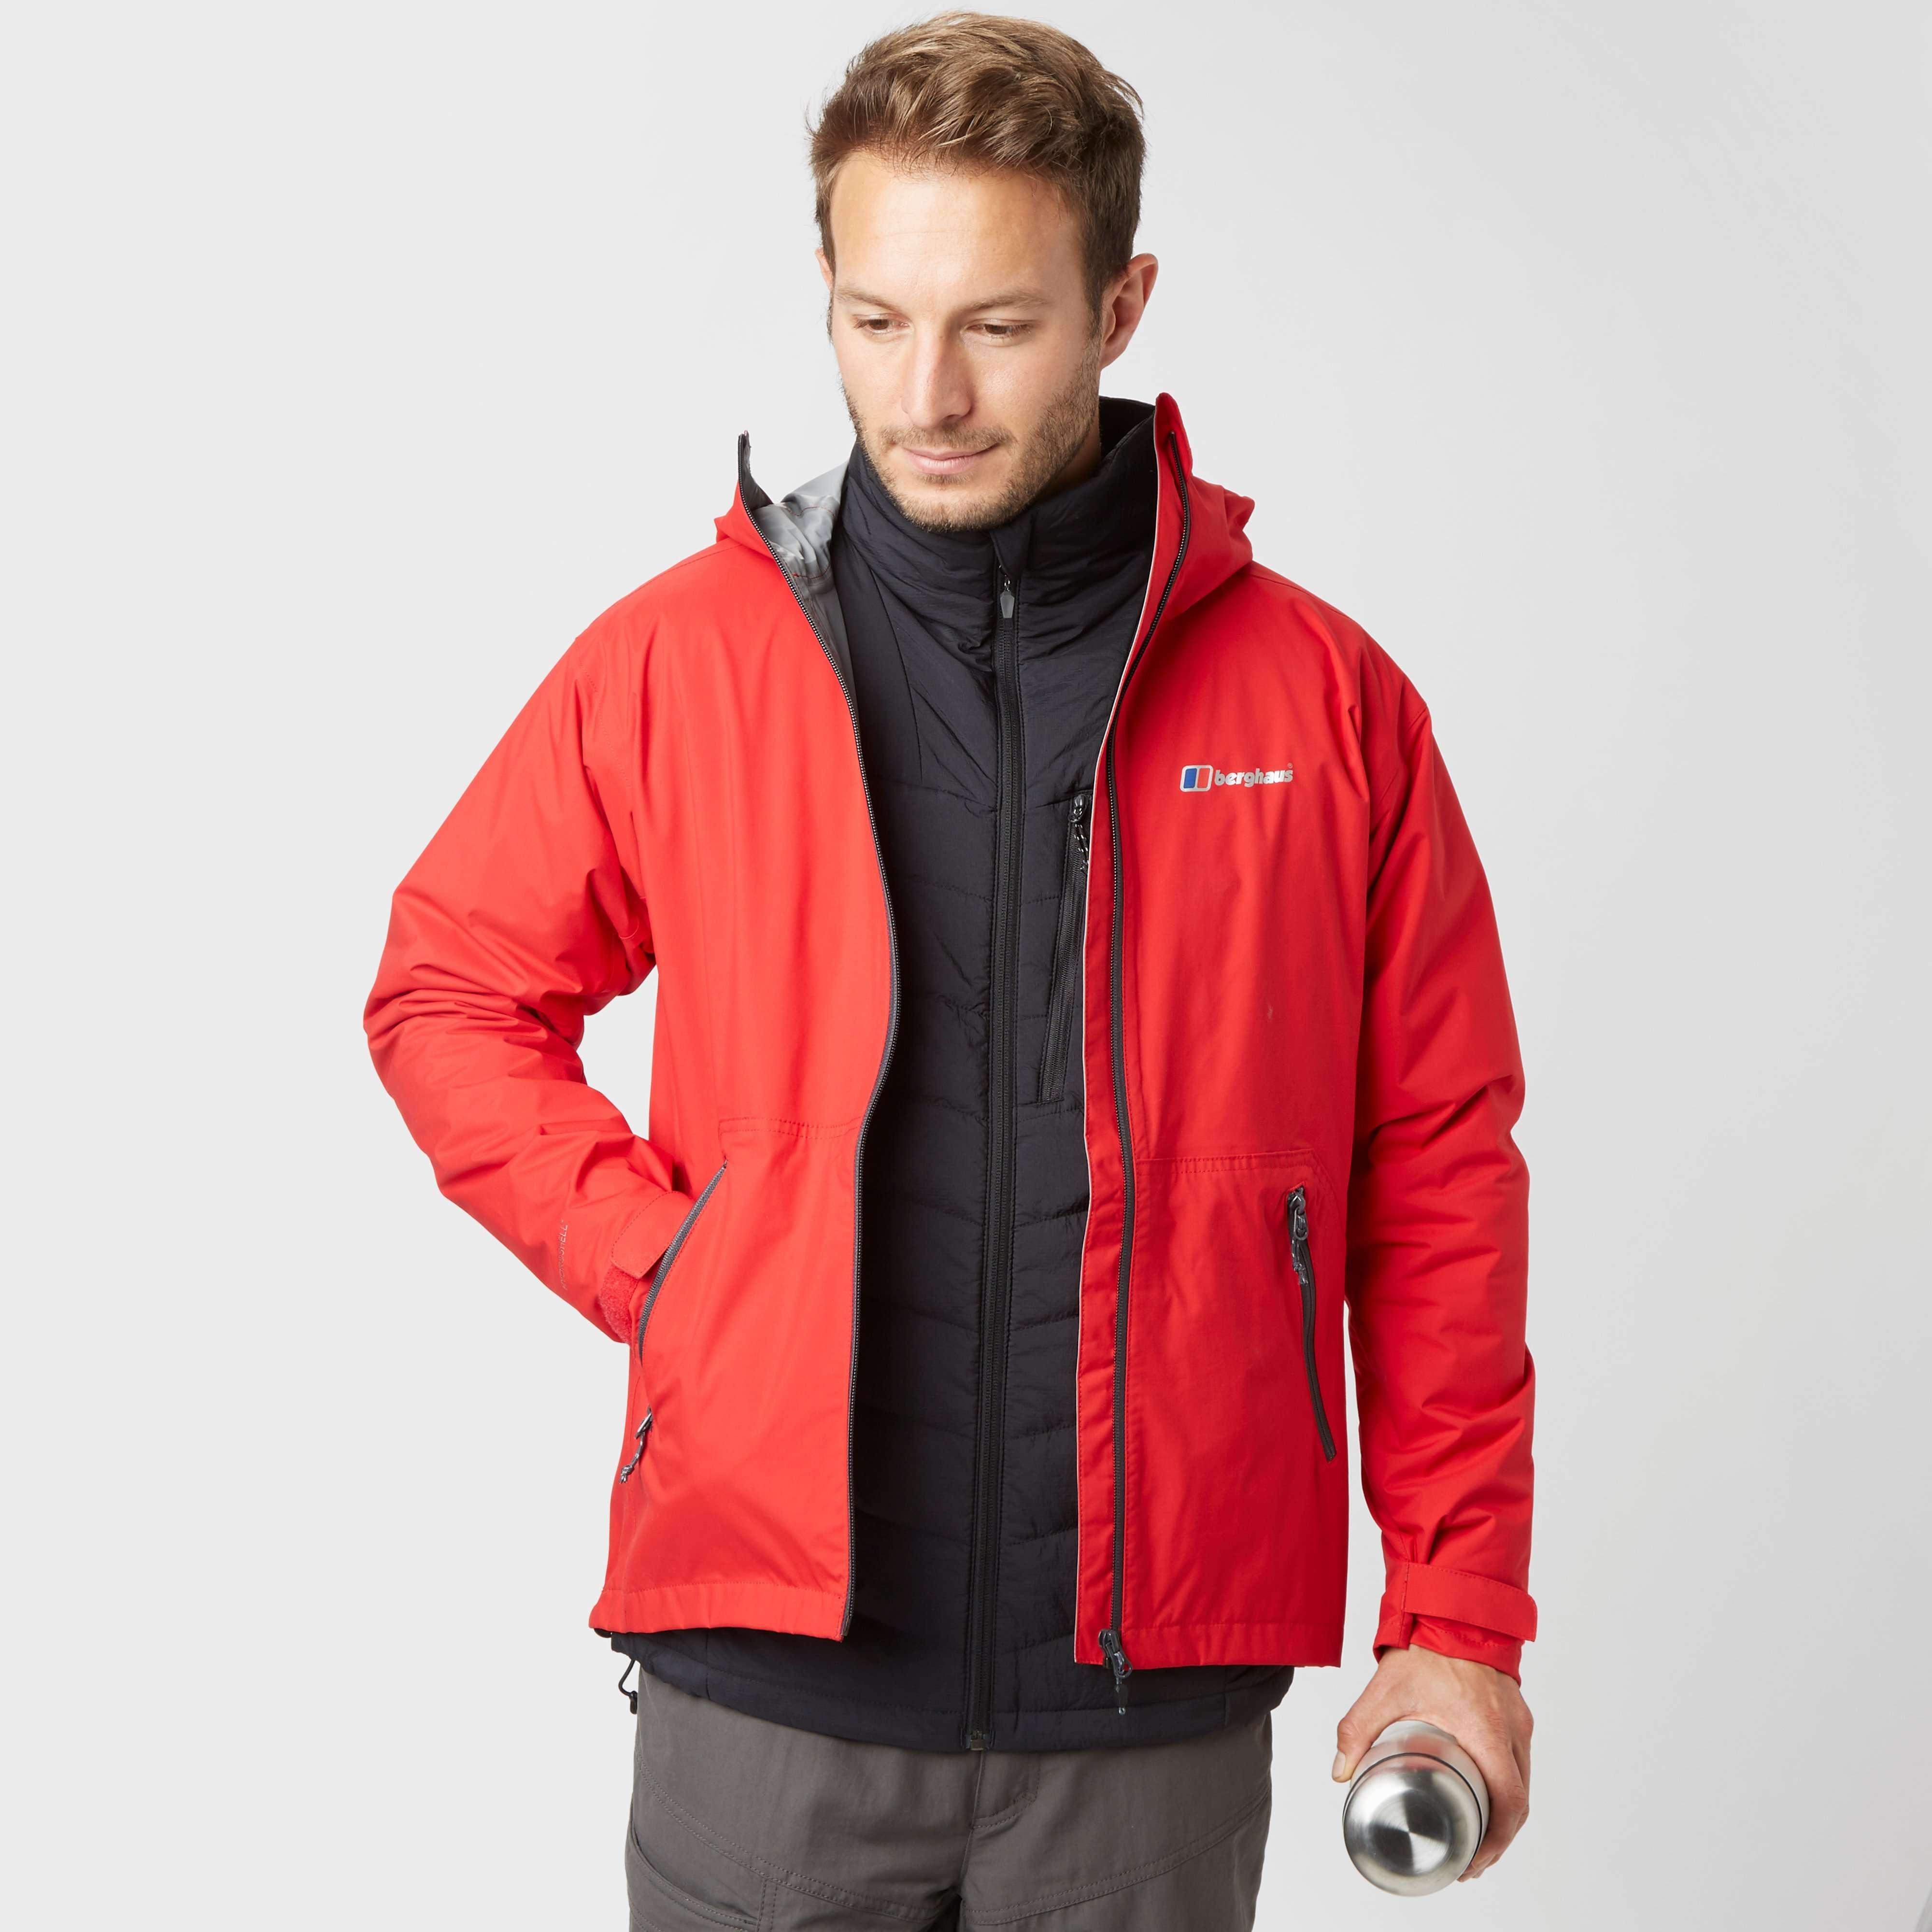 BERGHAUS Men's Stormcloud Hydroshell Jacket